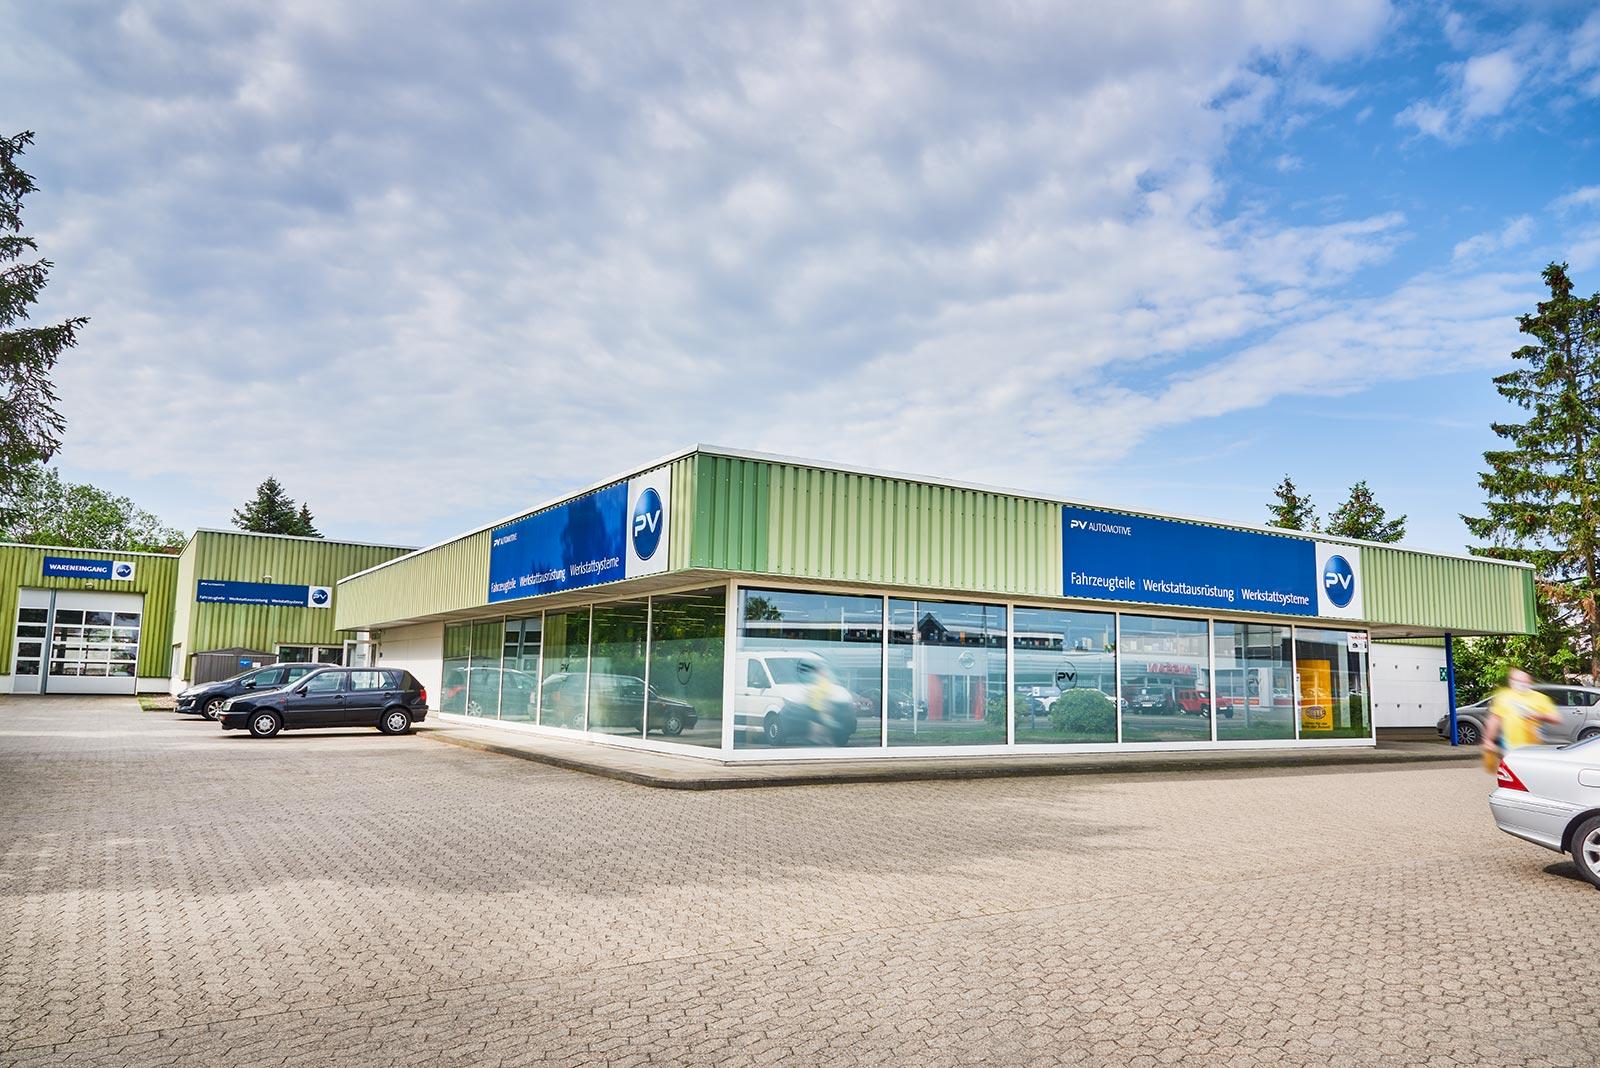 Immobilie in Goslar: Single-Tenant: Autoteilehandel